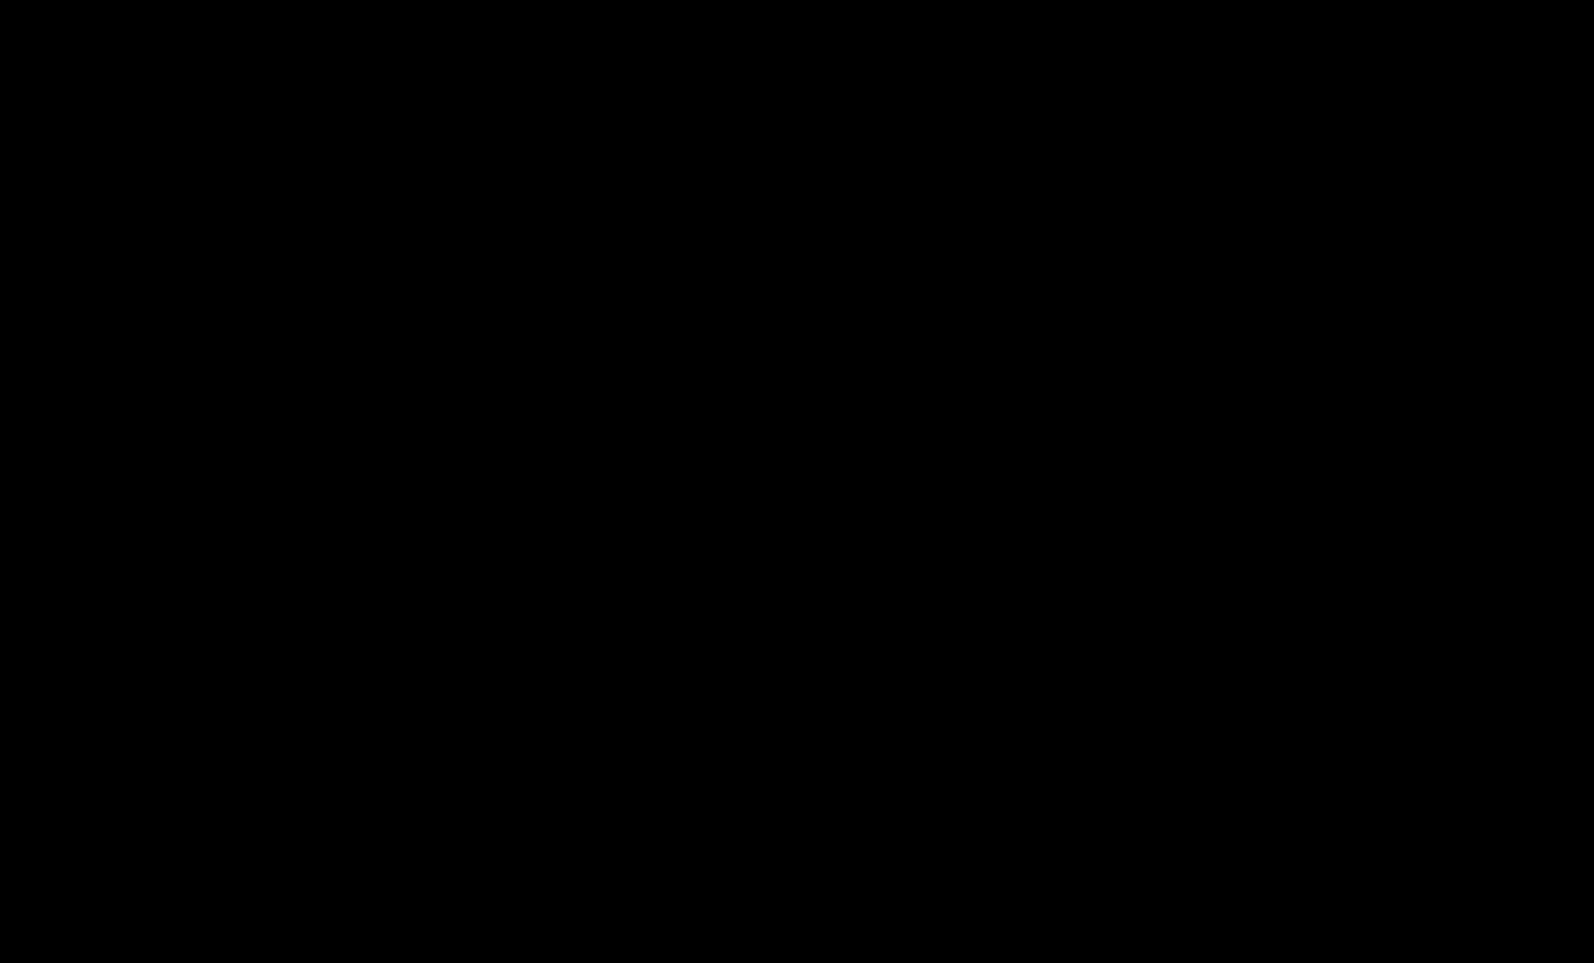 Biotin-dPEG®₃-TFPA